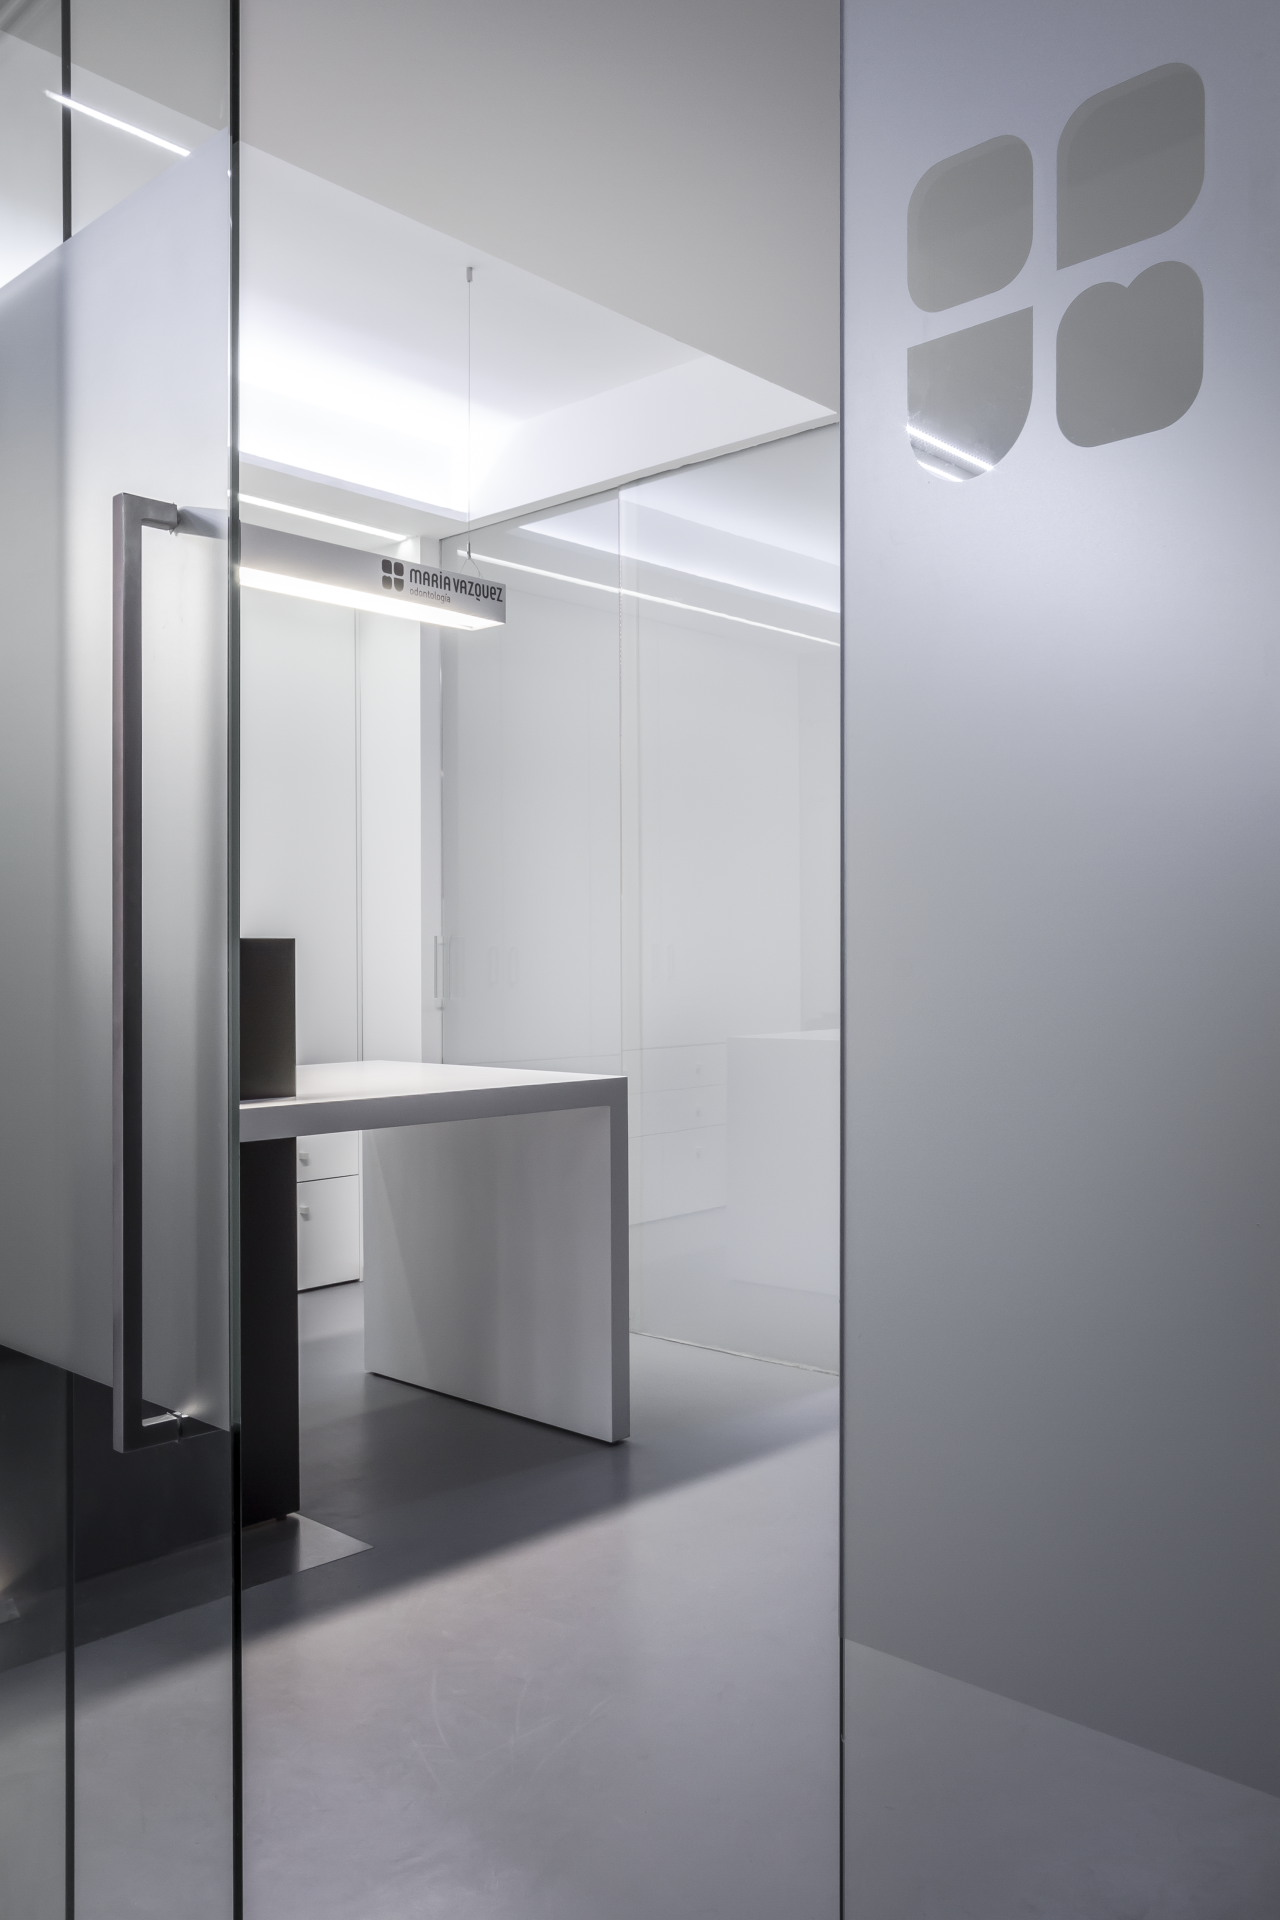 fotografia-arquitectura-valencia-german-cabo-hernandez-clinica (10)